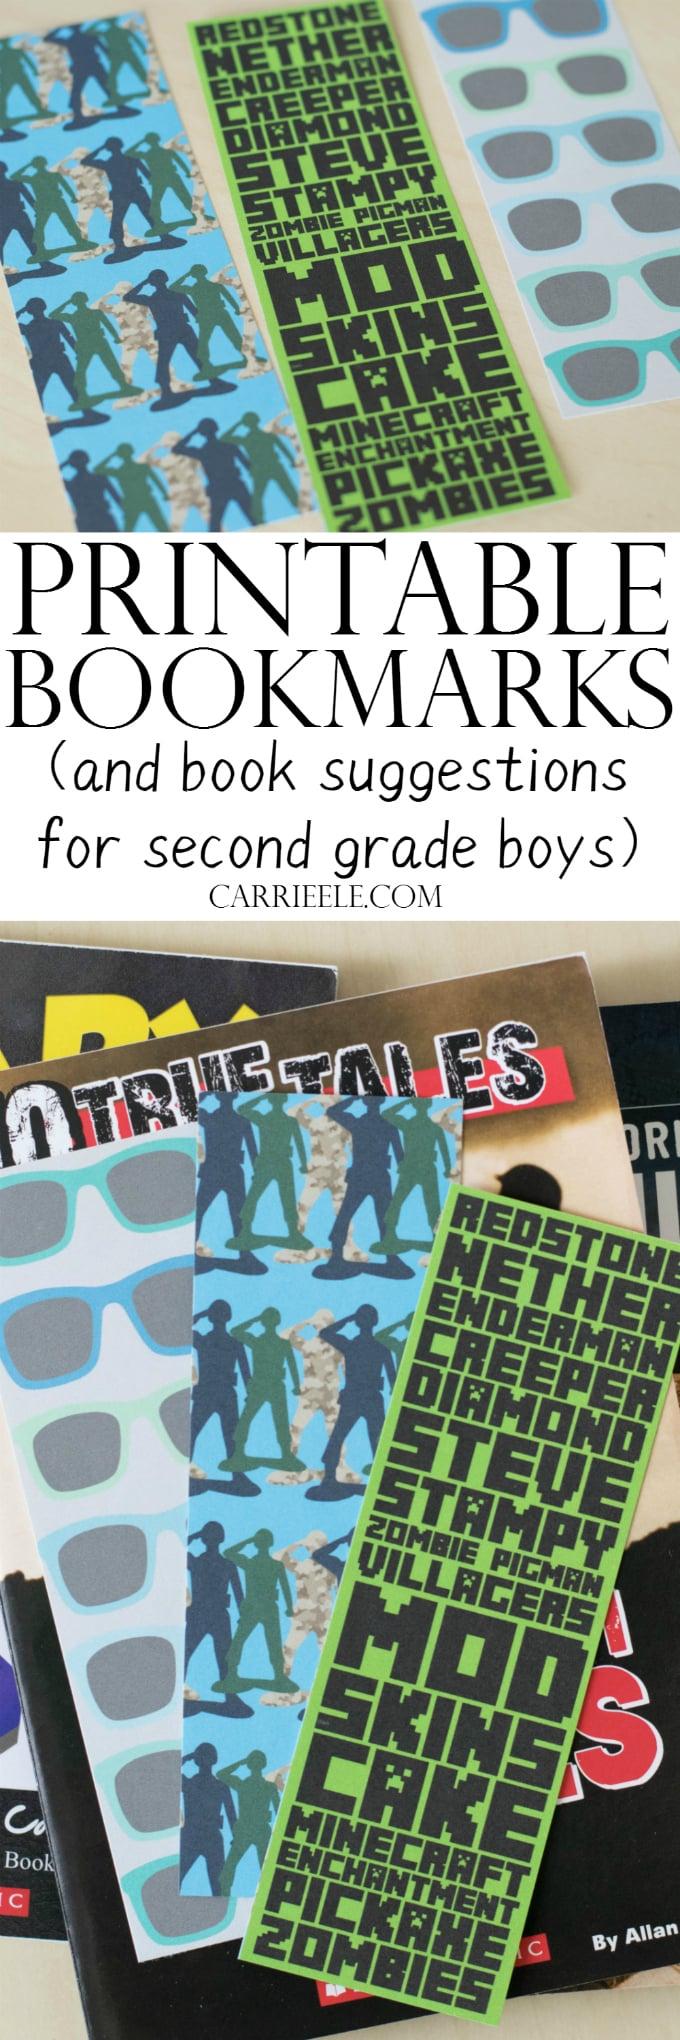 Printable Bookmarks for Boys